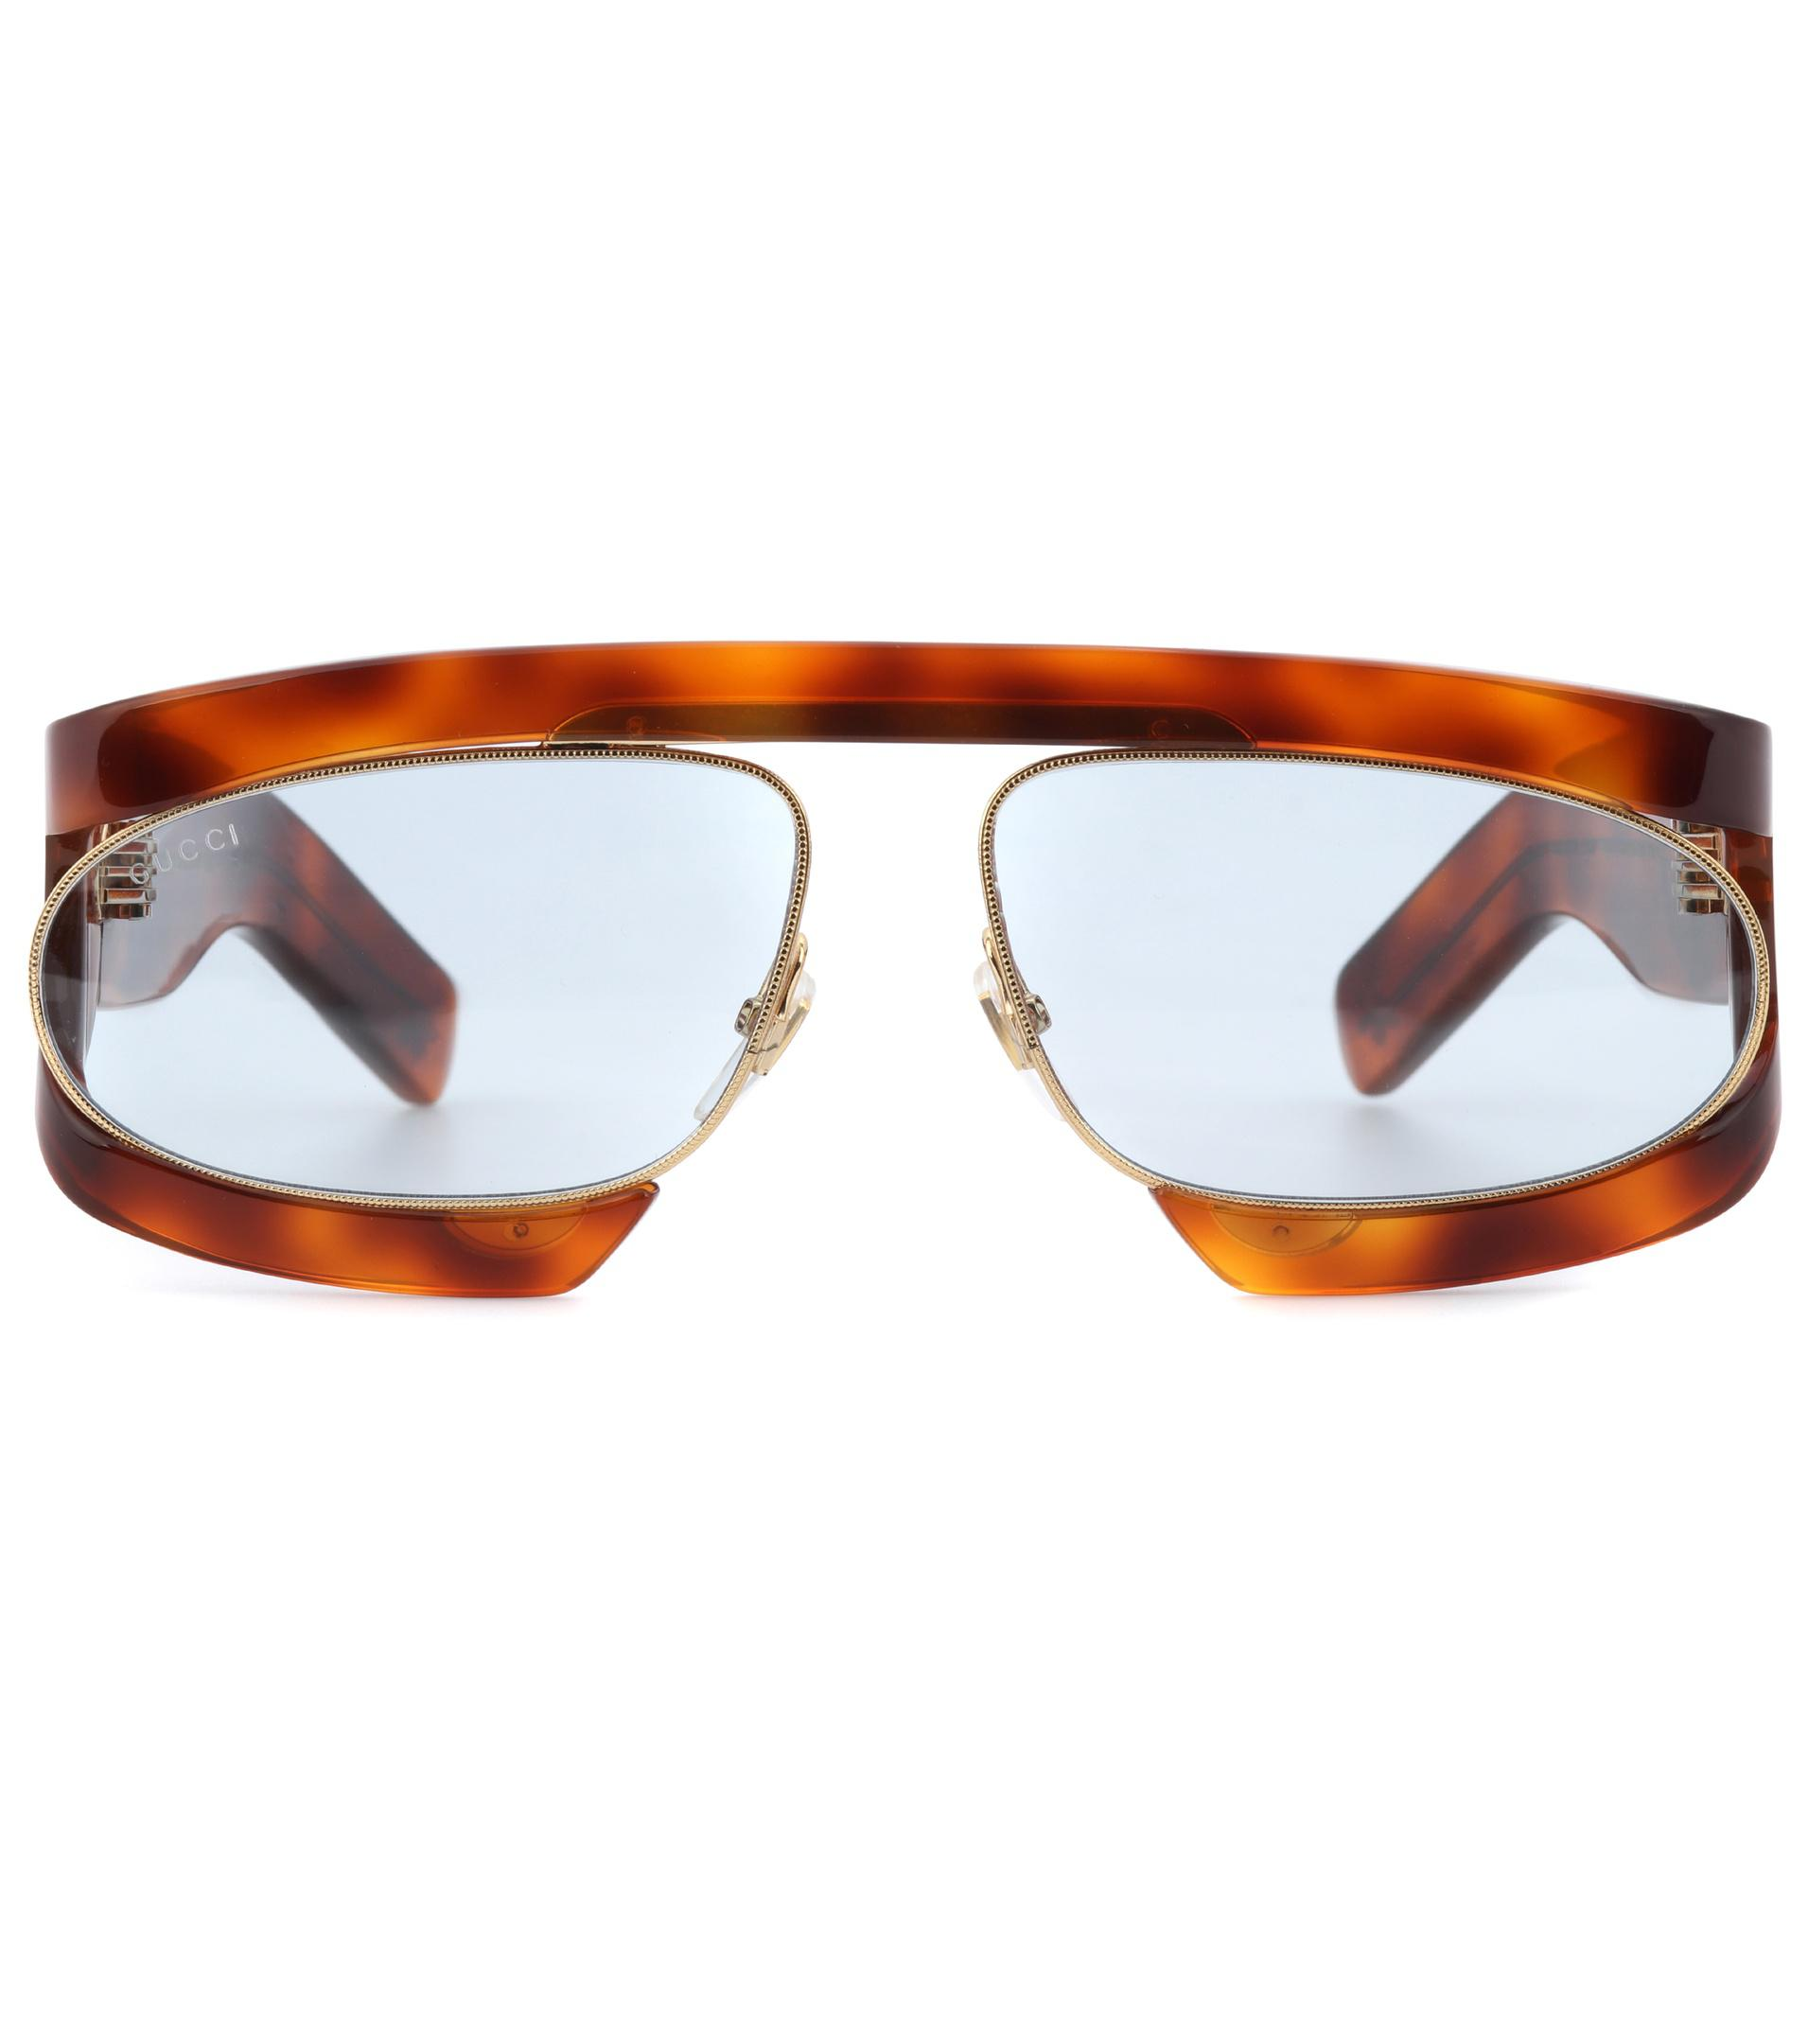 fe78f9f88a Gucci Tortoiseshell-effect Sunglasses in Brown - Lyst